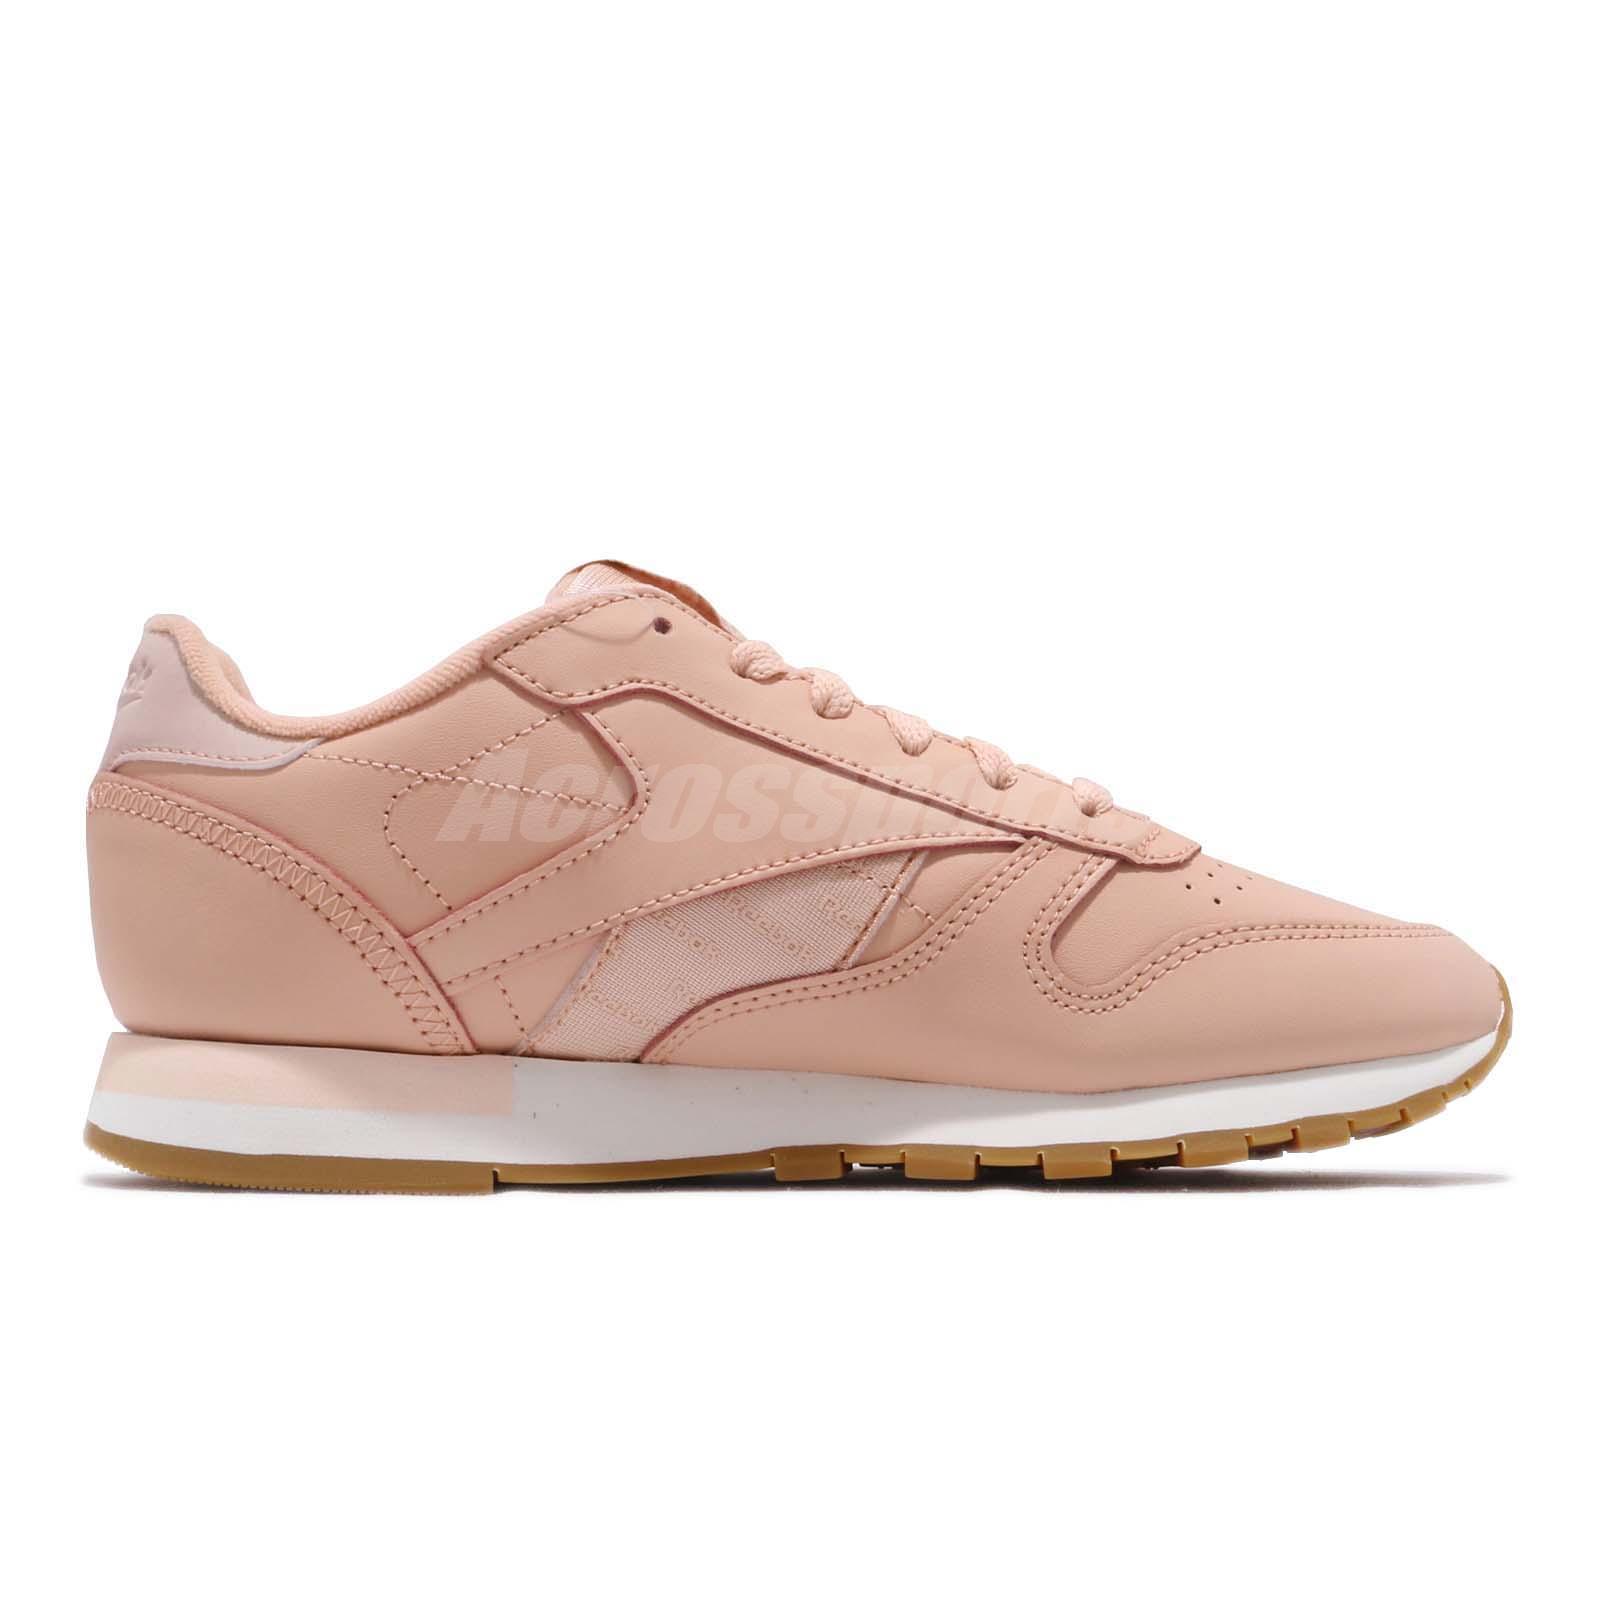 2b7d5a1bd19c5 Reebok Classic Leather Altered Rose Cloud Gold Gum Women Shoes ...